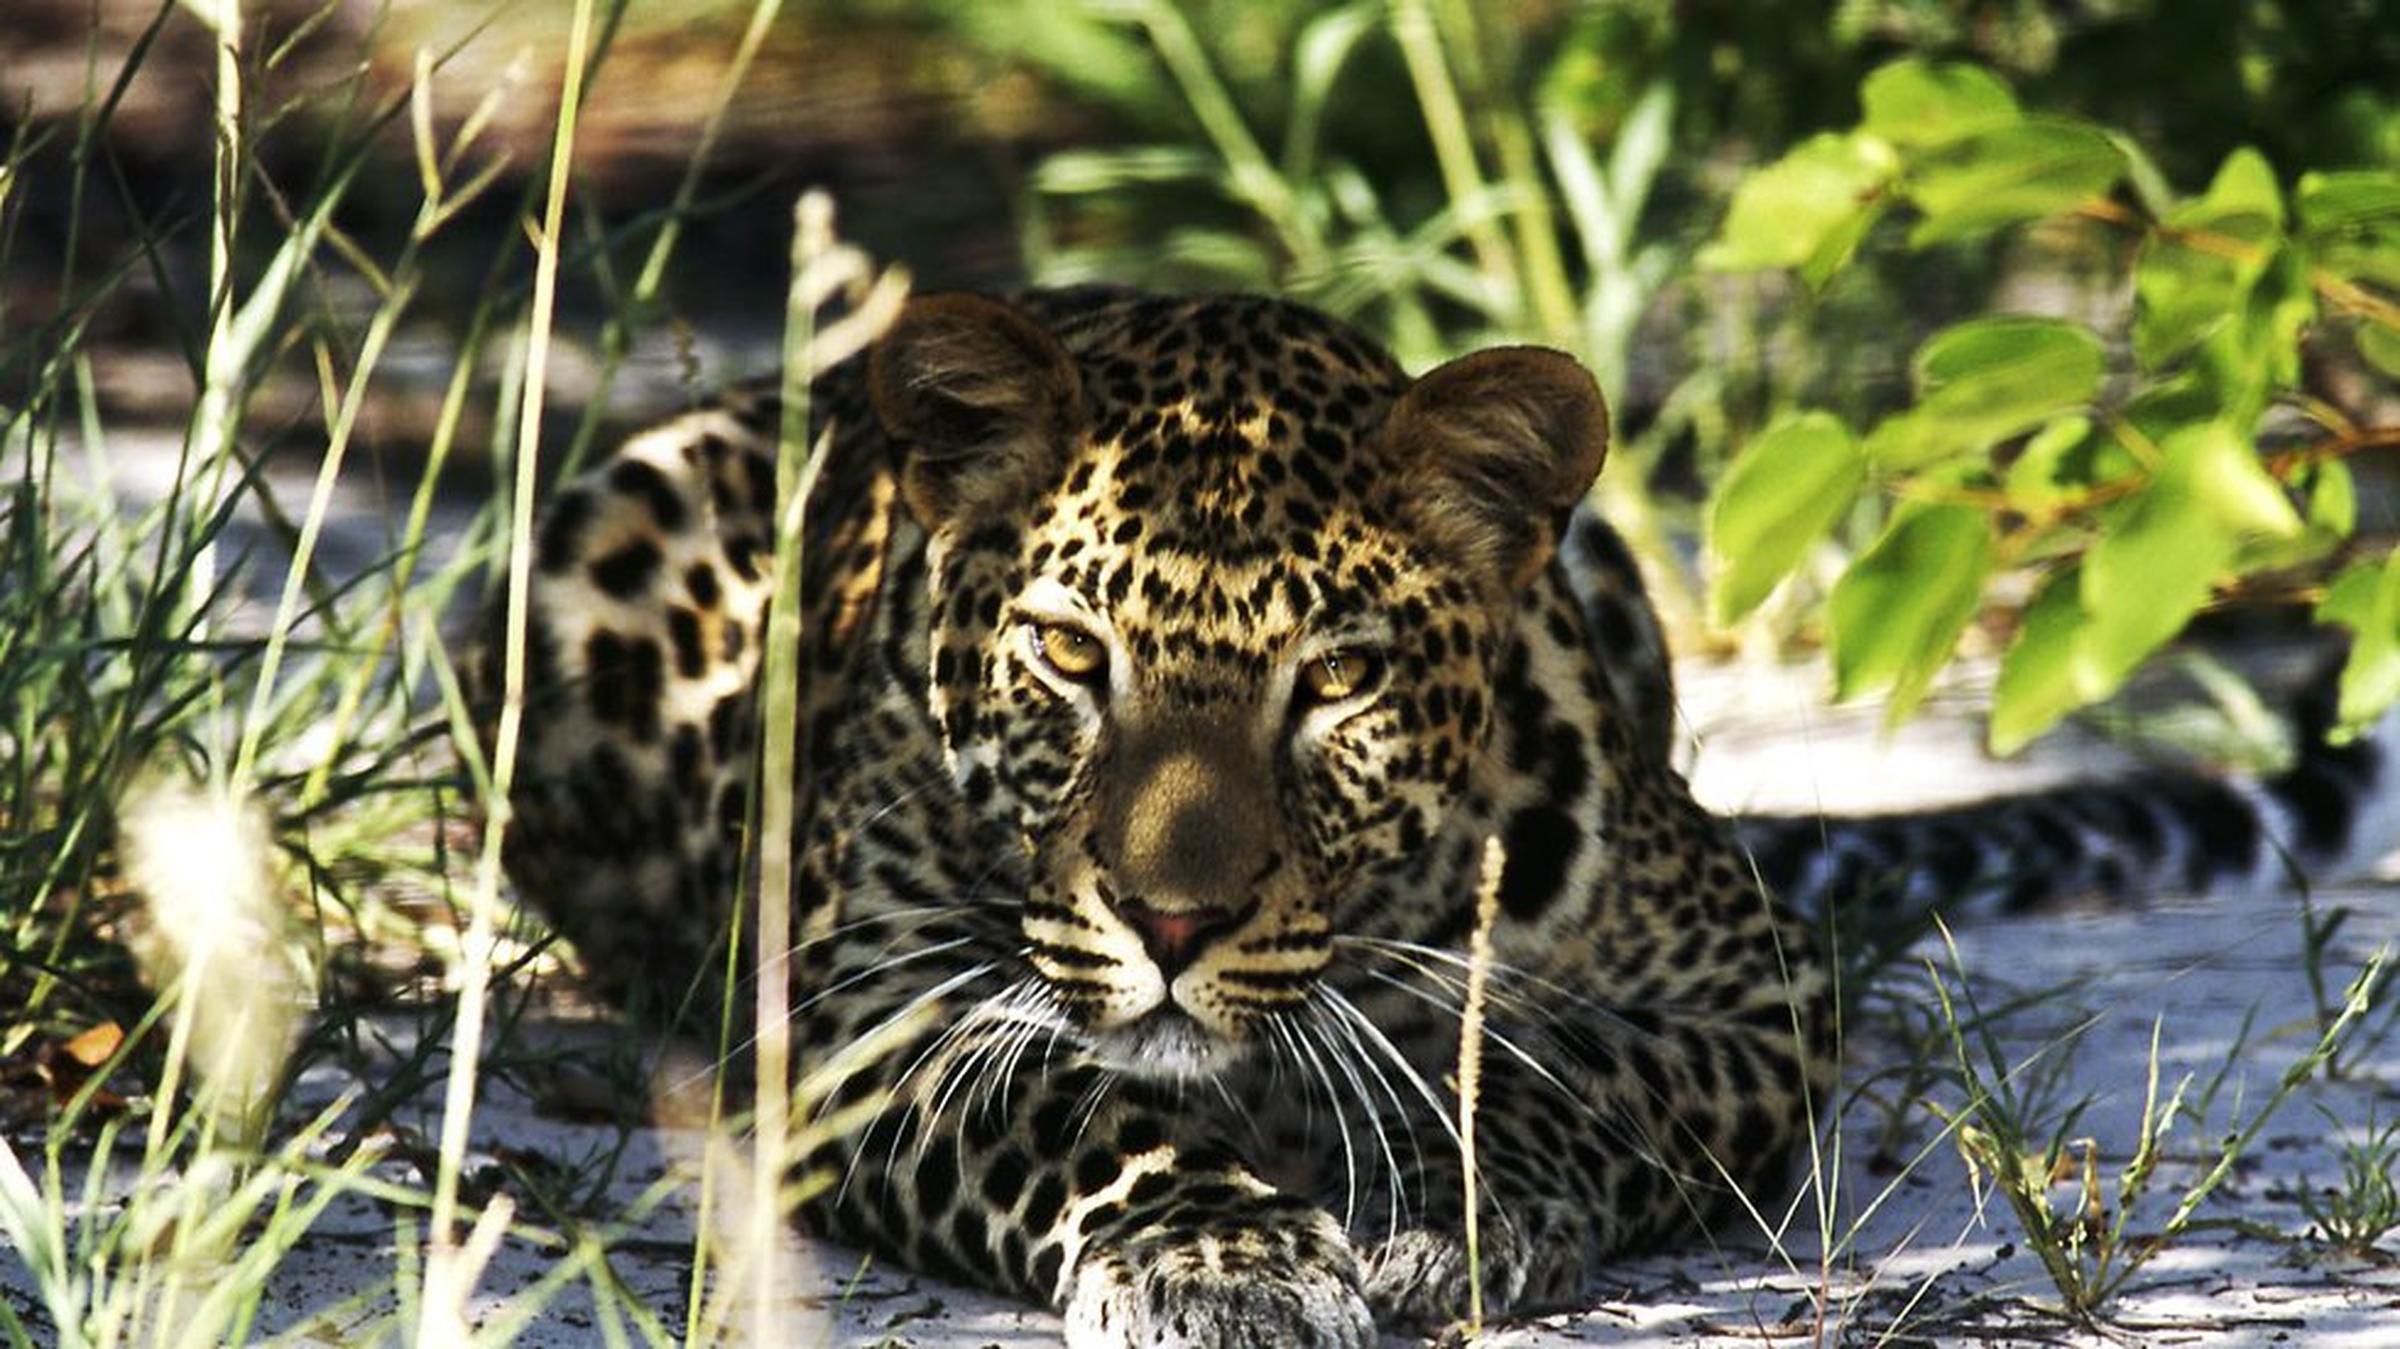 https://a.storyblok.com/f/105614/980x551/1e5987ca2a/leopard-1.jpeg